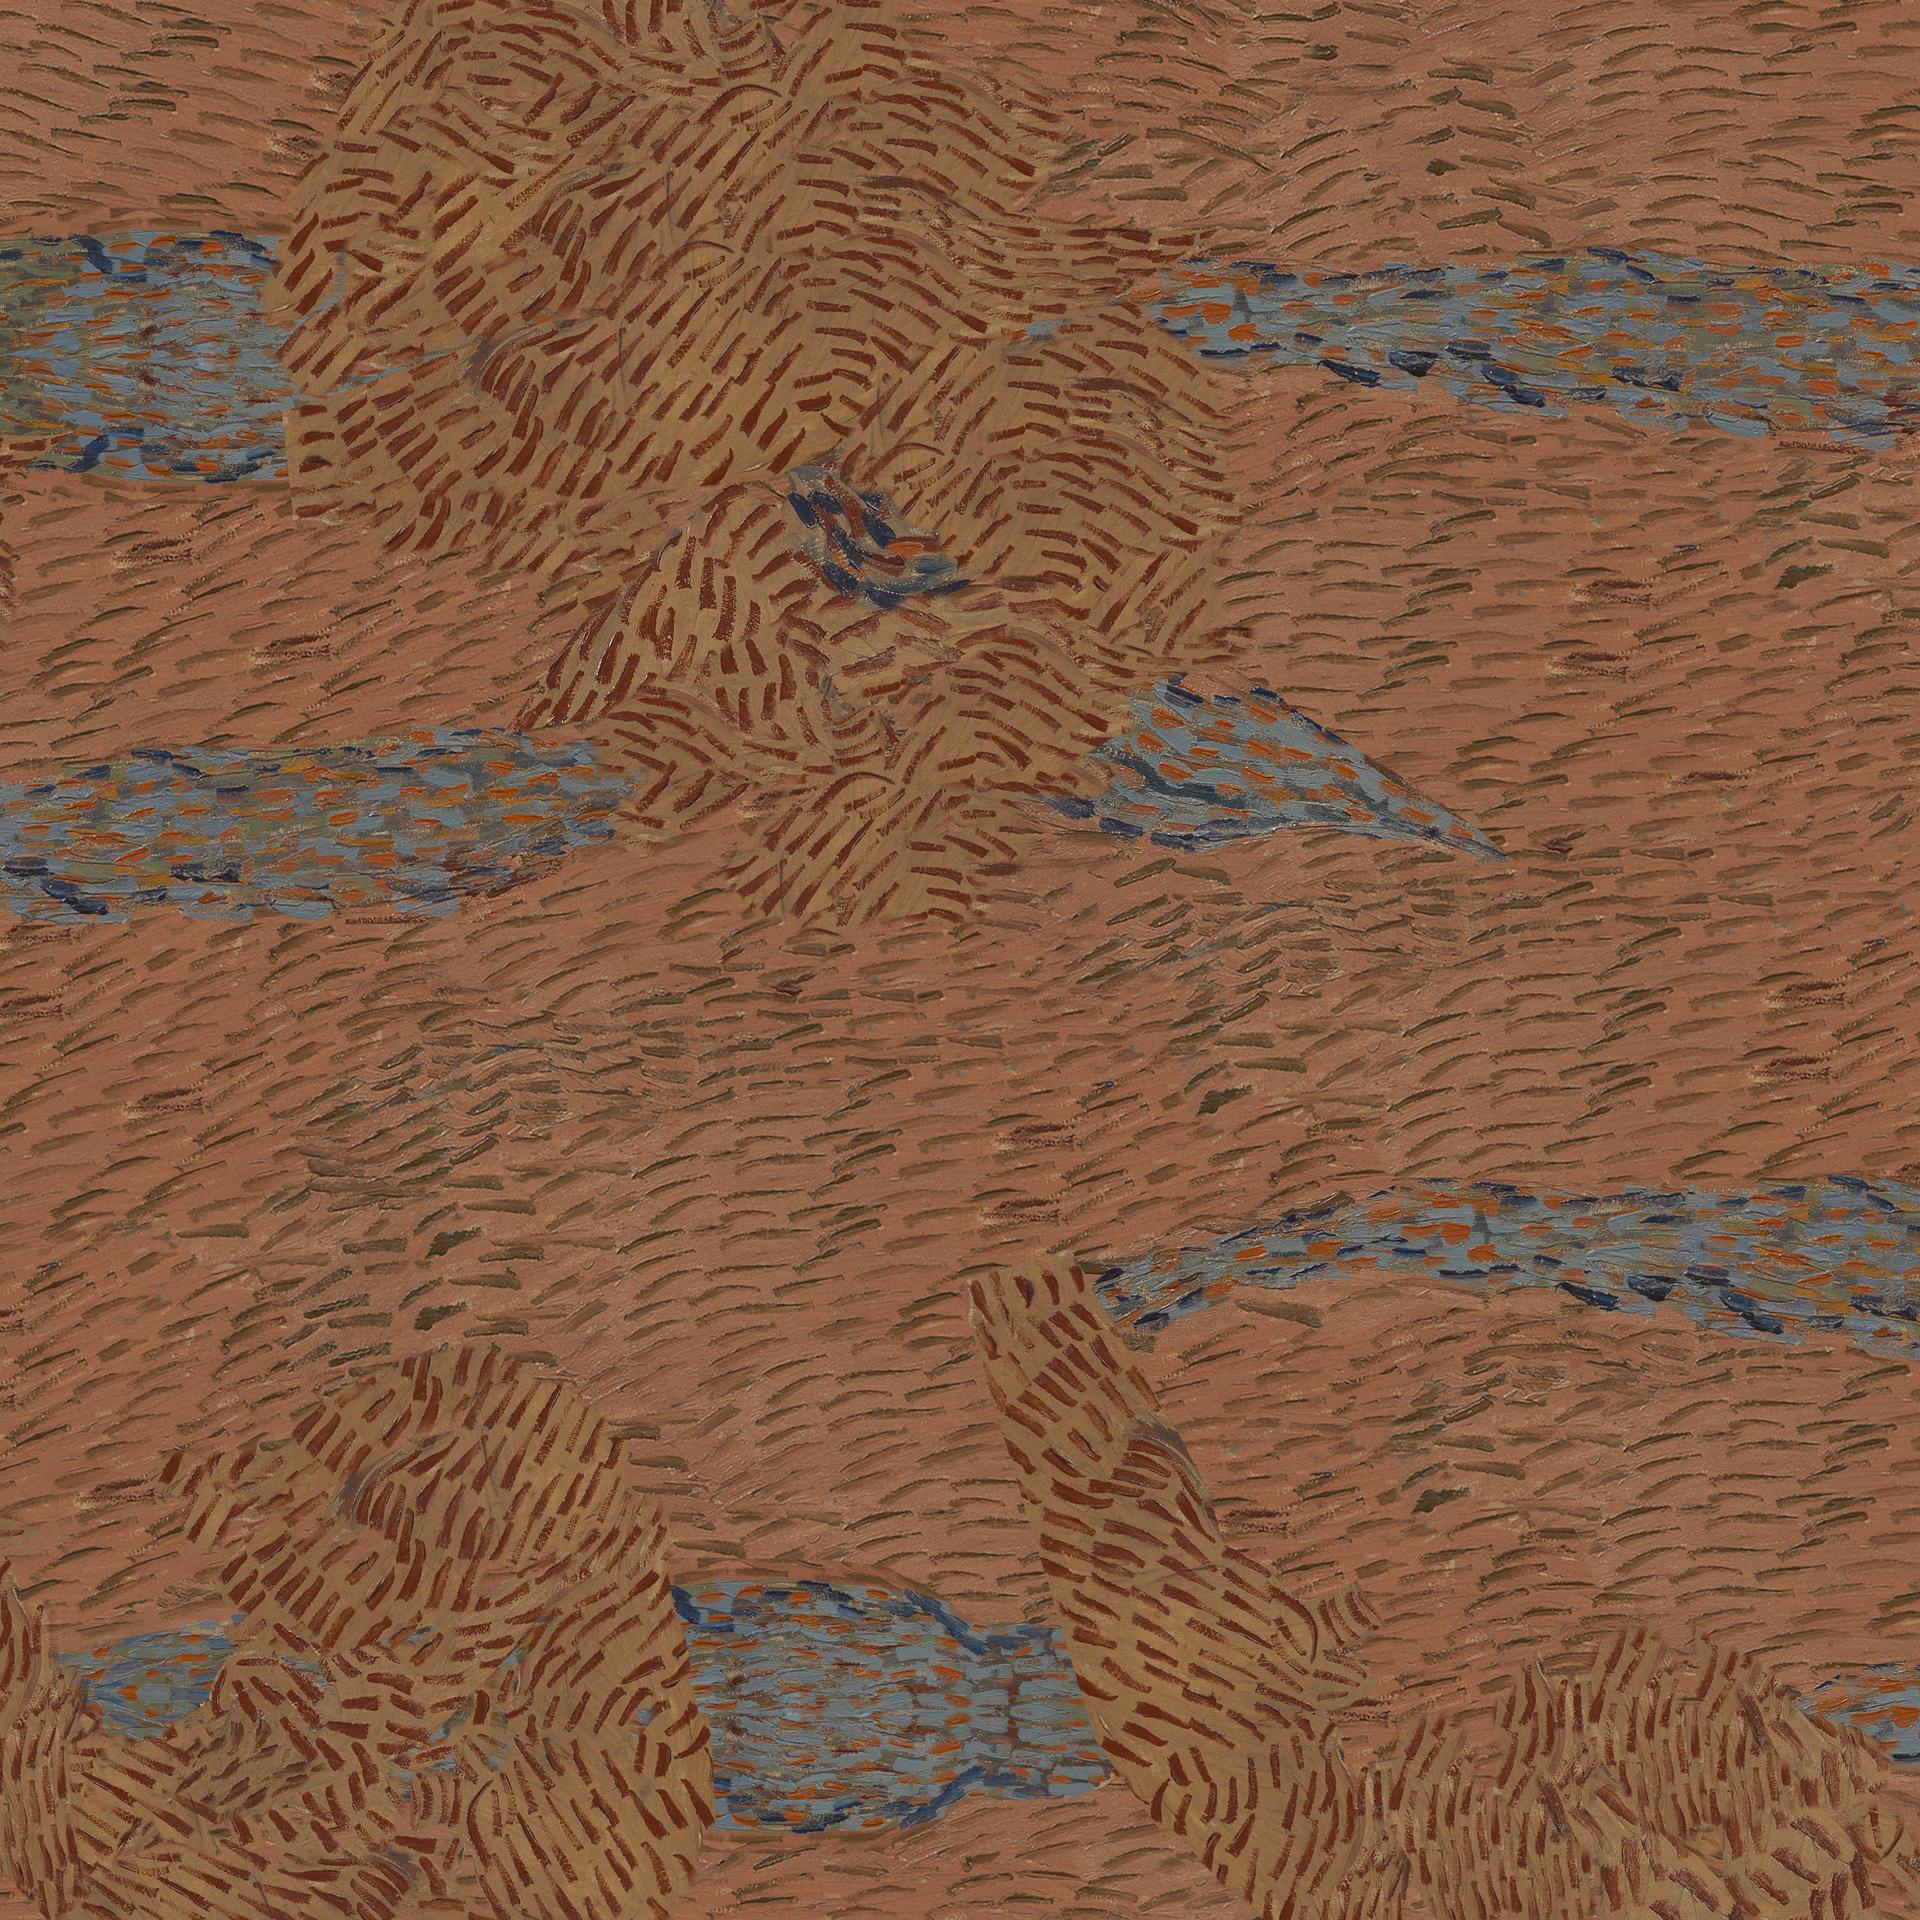 textures_saint_remy_floor_blowup.png